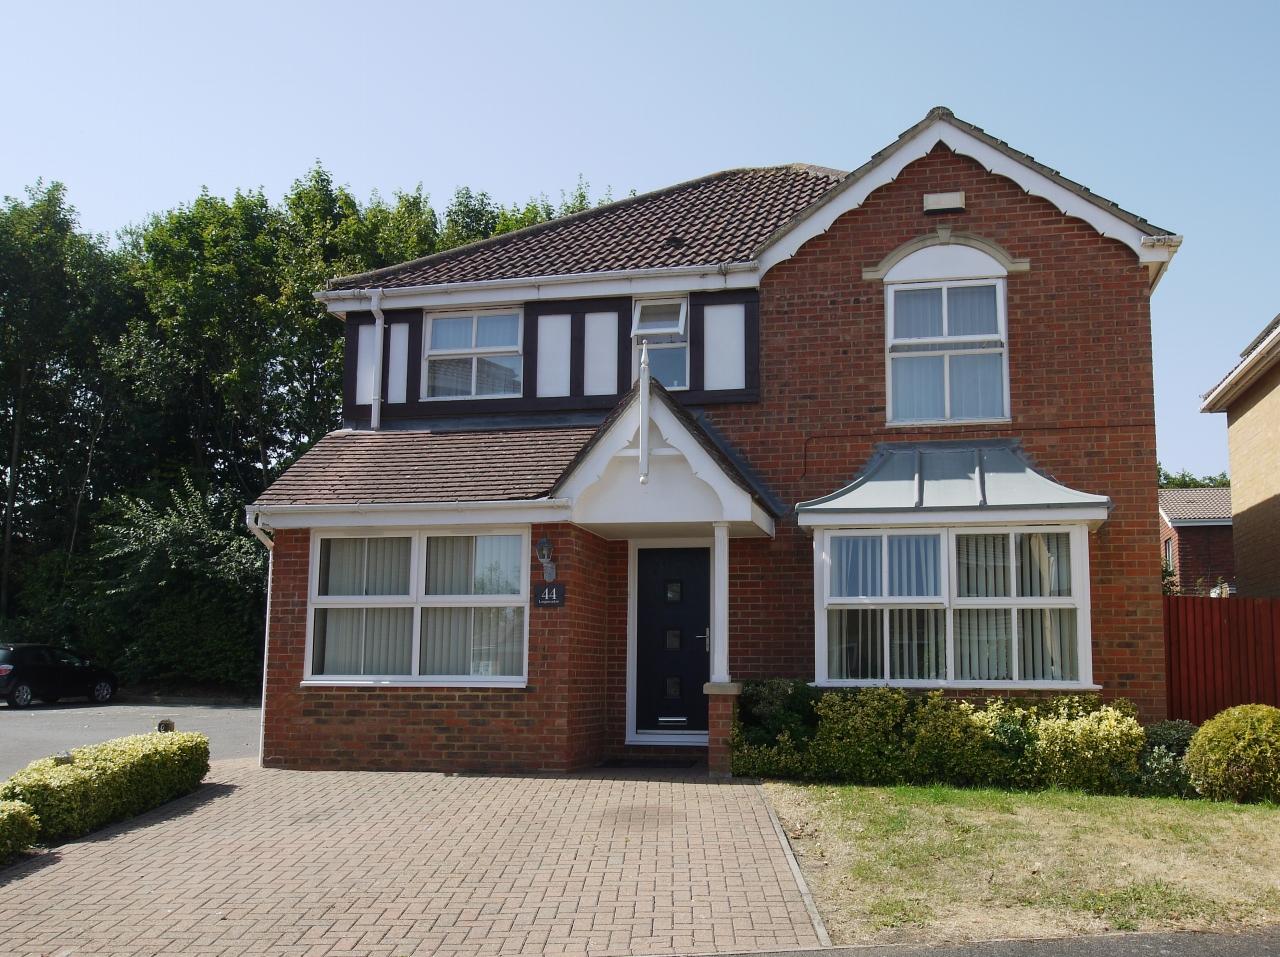 4 bedroom detached house Let in Sevenoaks - Main Image